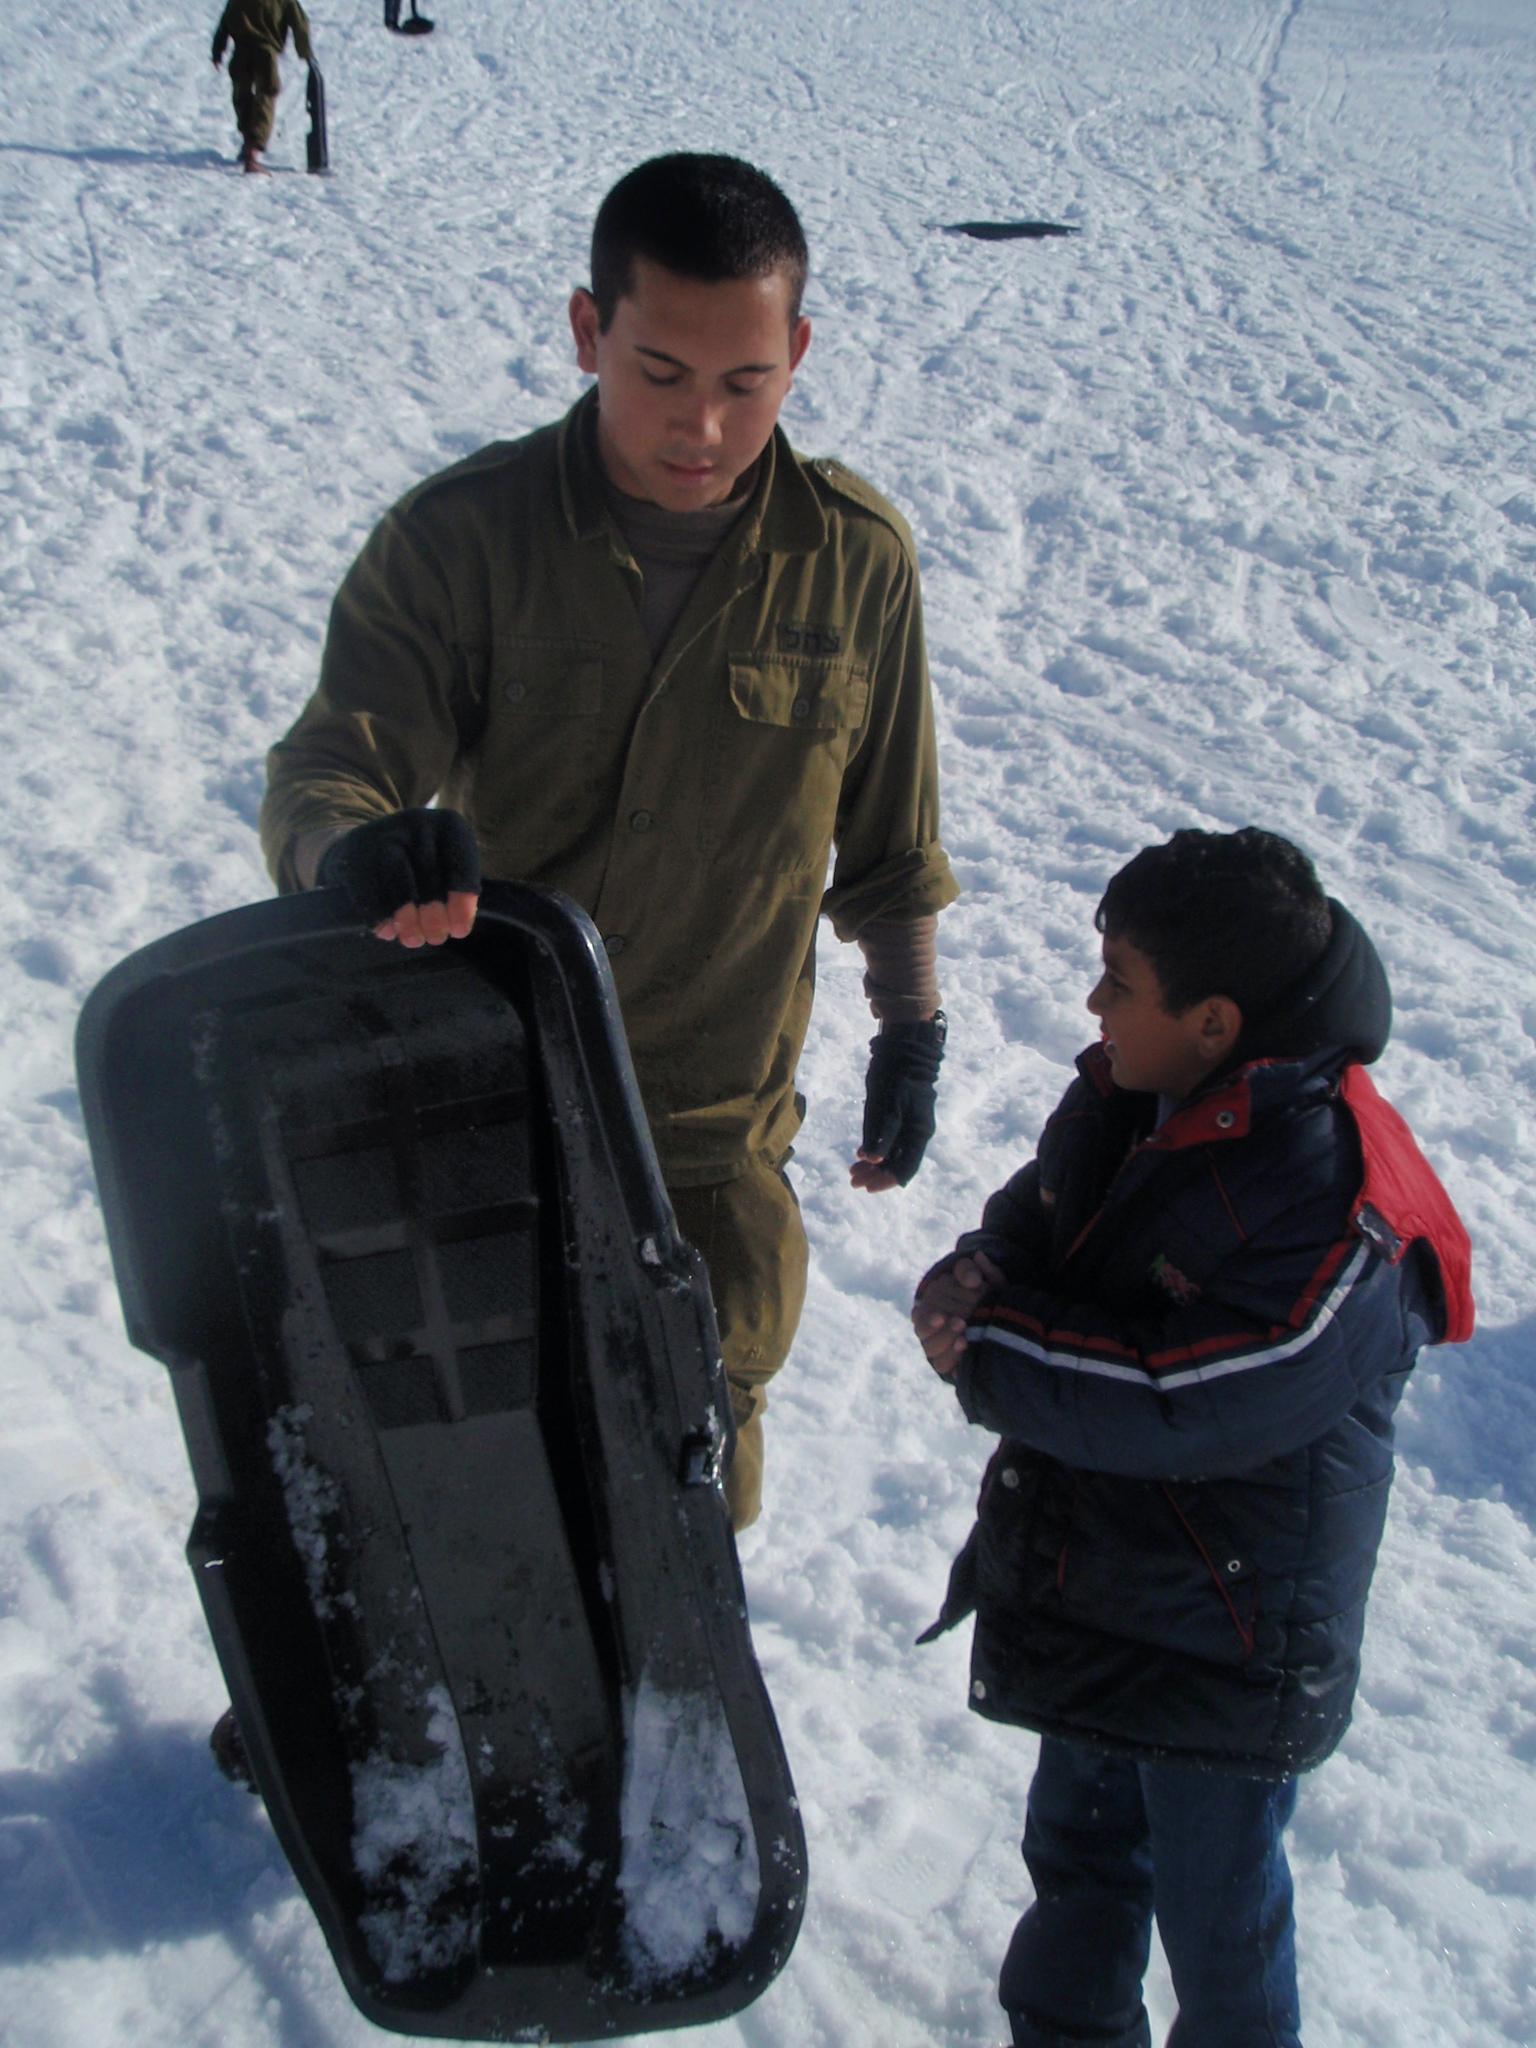 File:Flickr - Israel Defense Forces - Palestinian Children Diagnosed